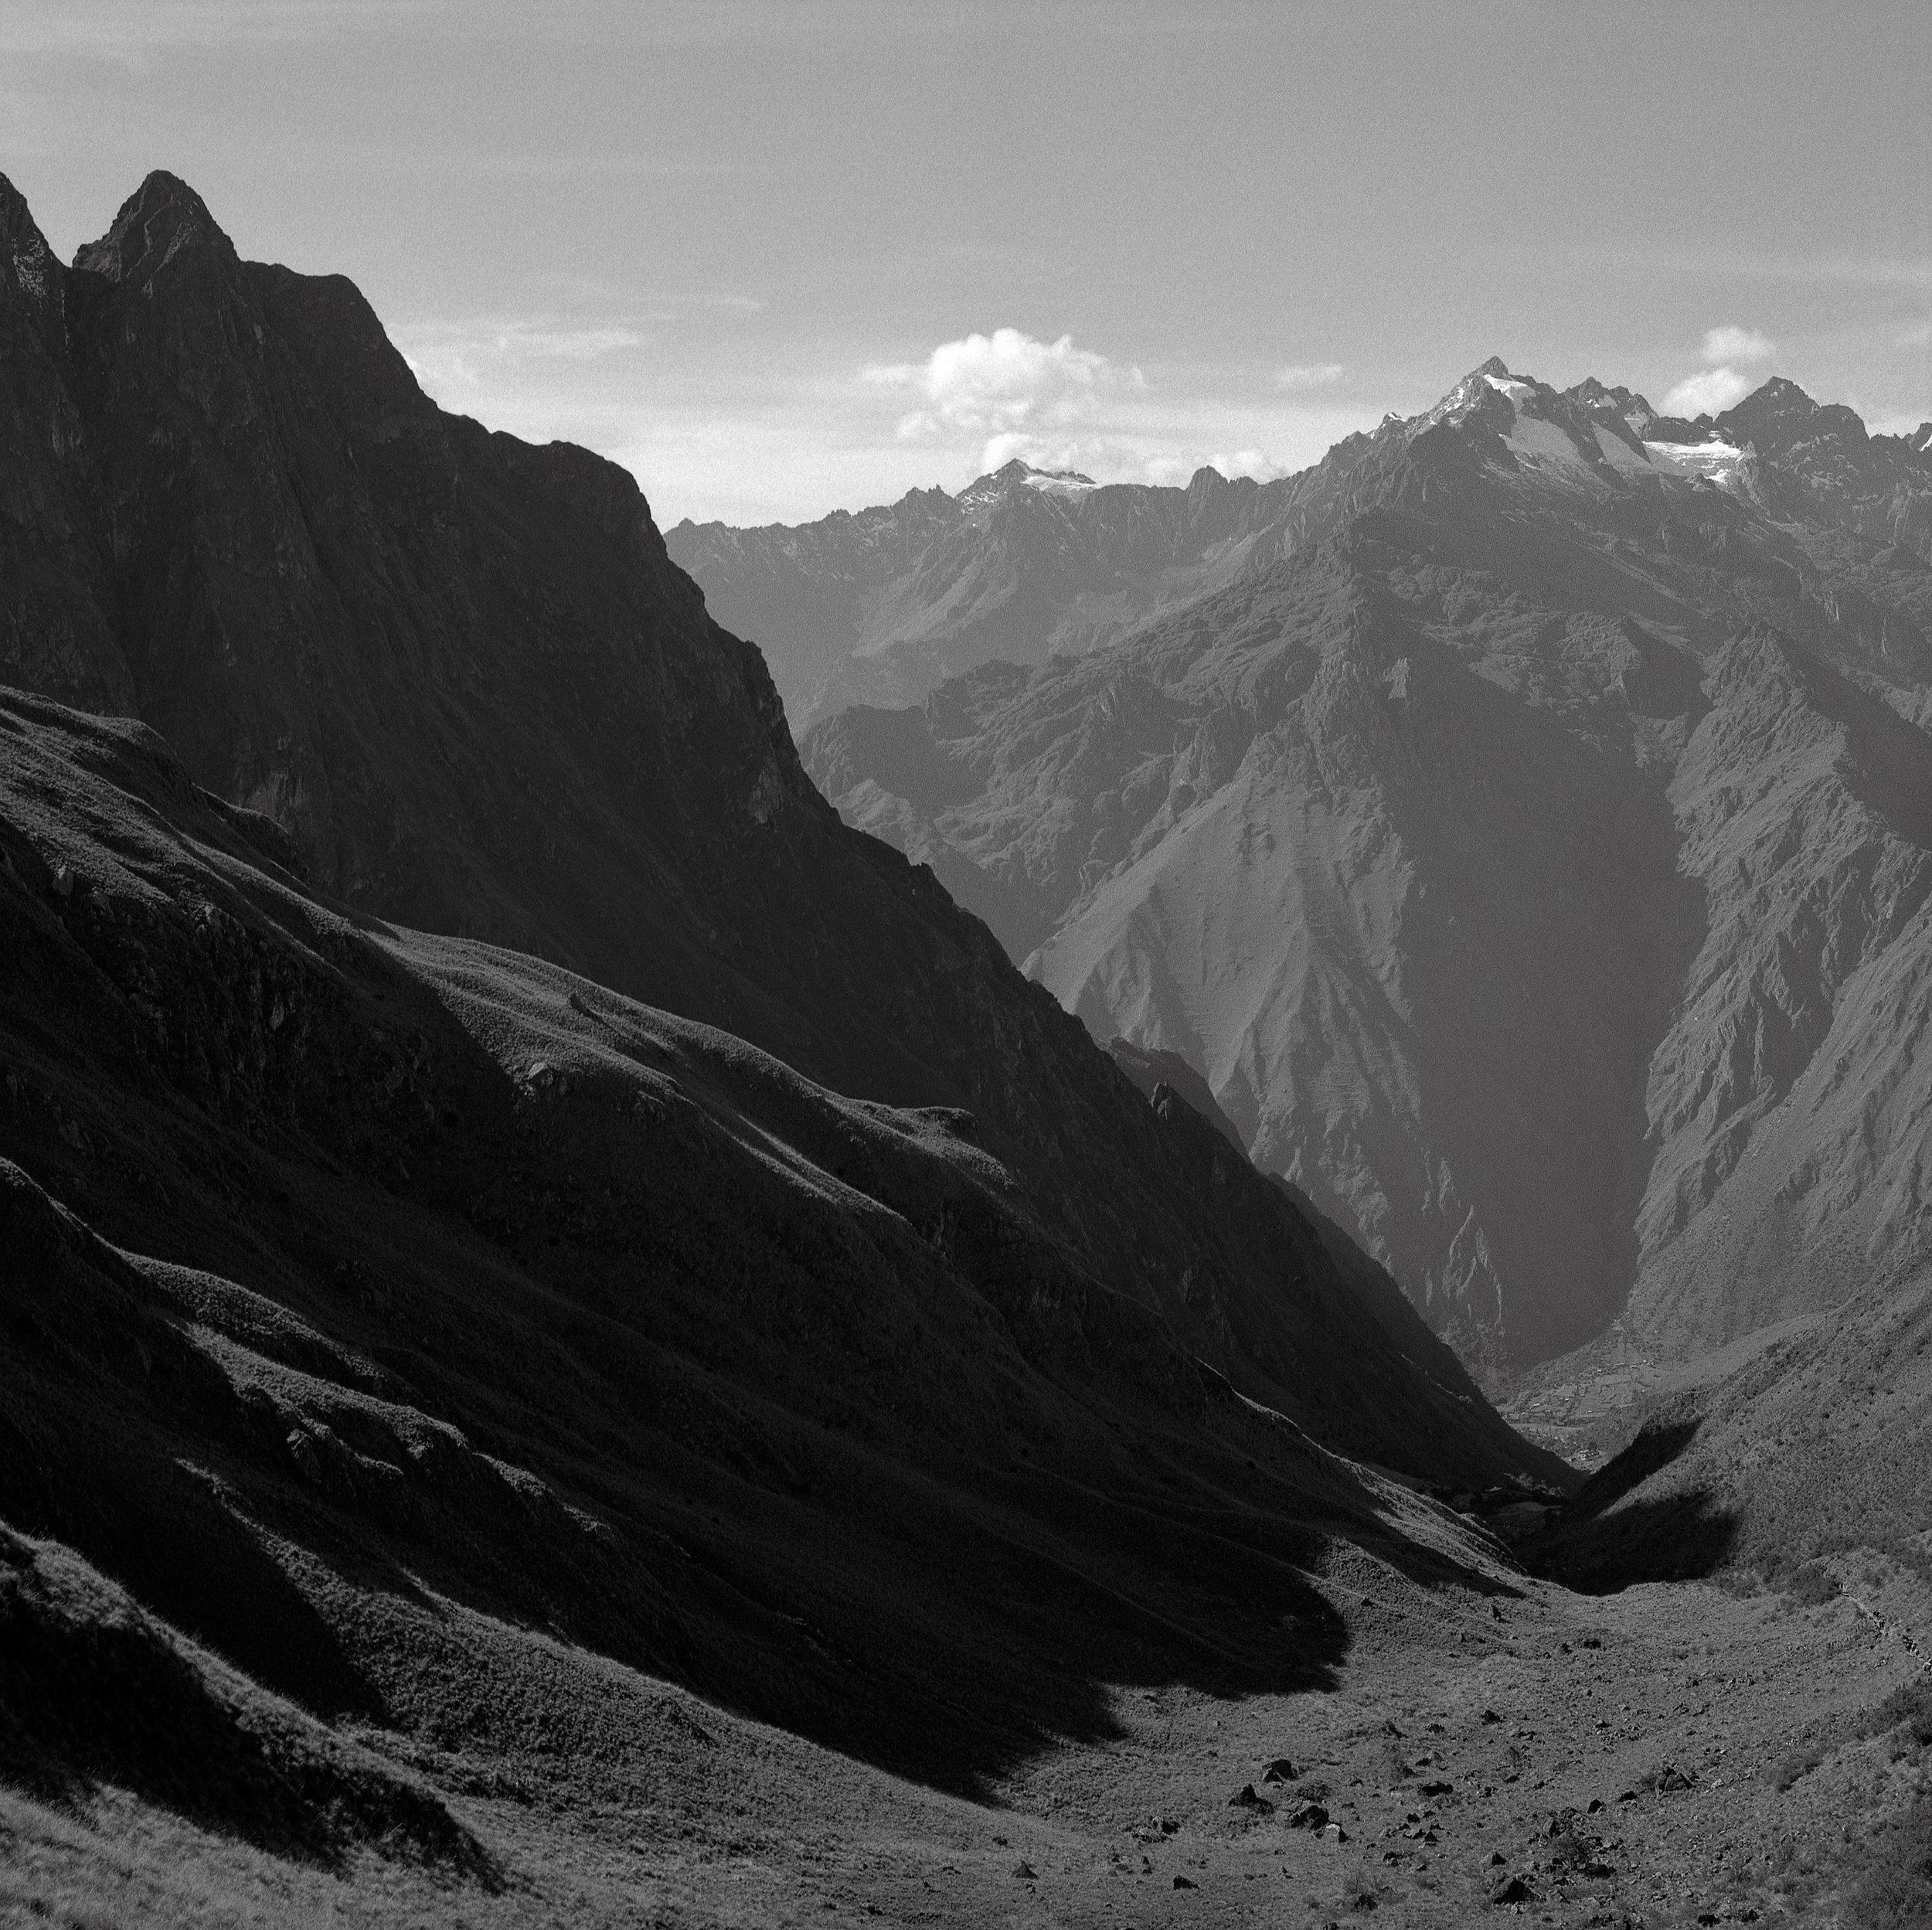 In the Valley of Llulluchapampa, Peru